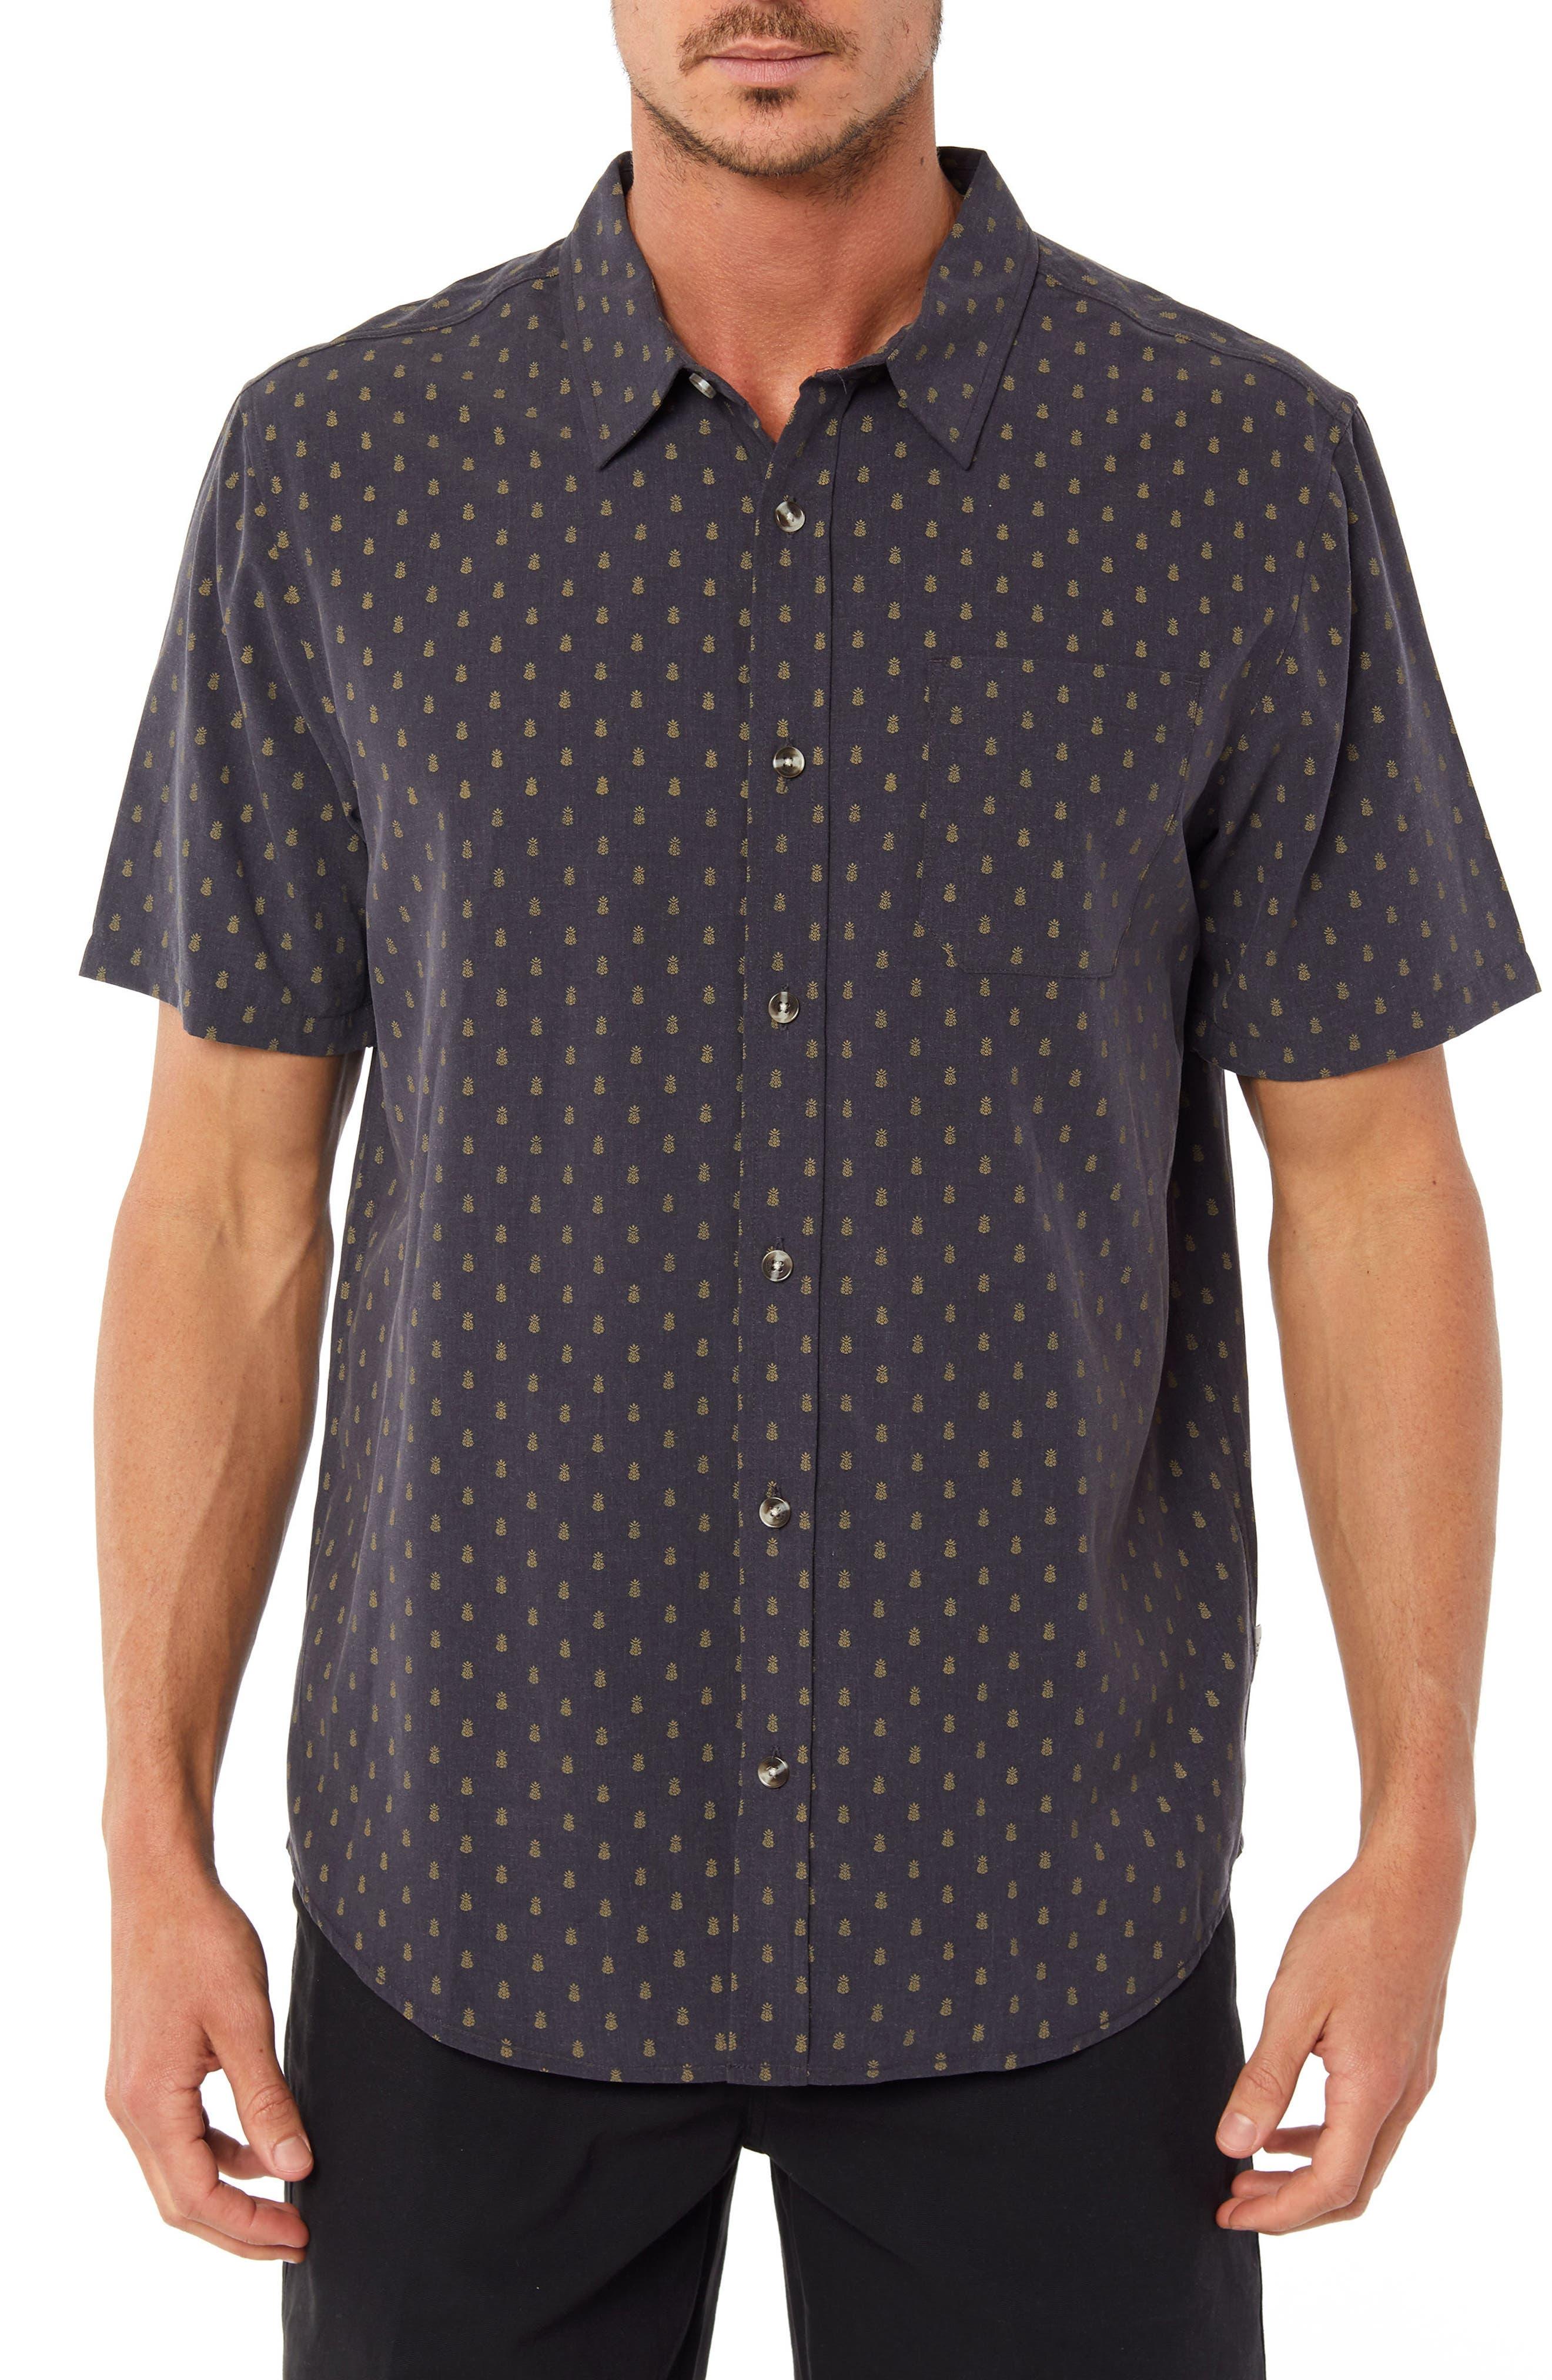 Home Grown Pineapple Sport Shirt,                         Main,                         color, 268